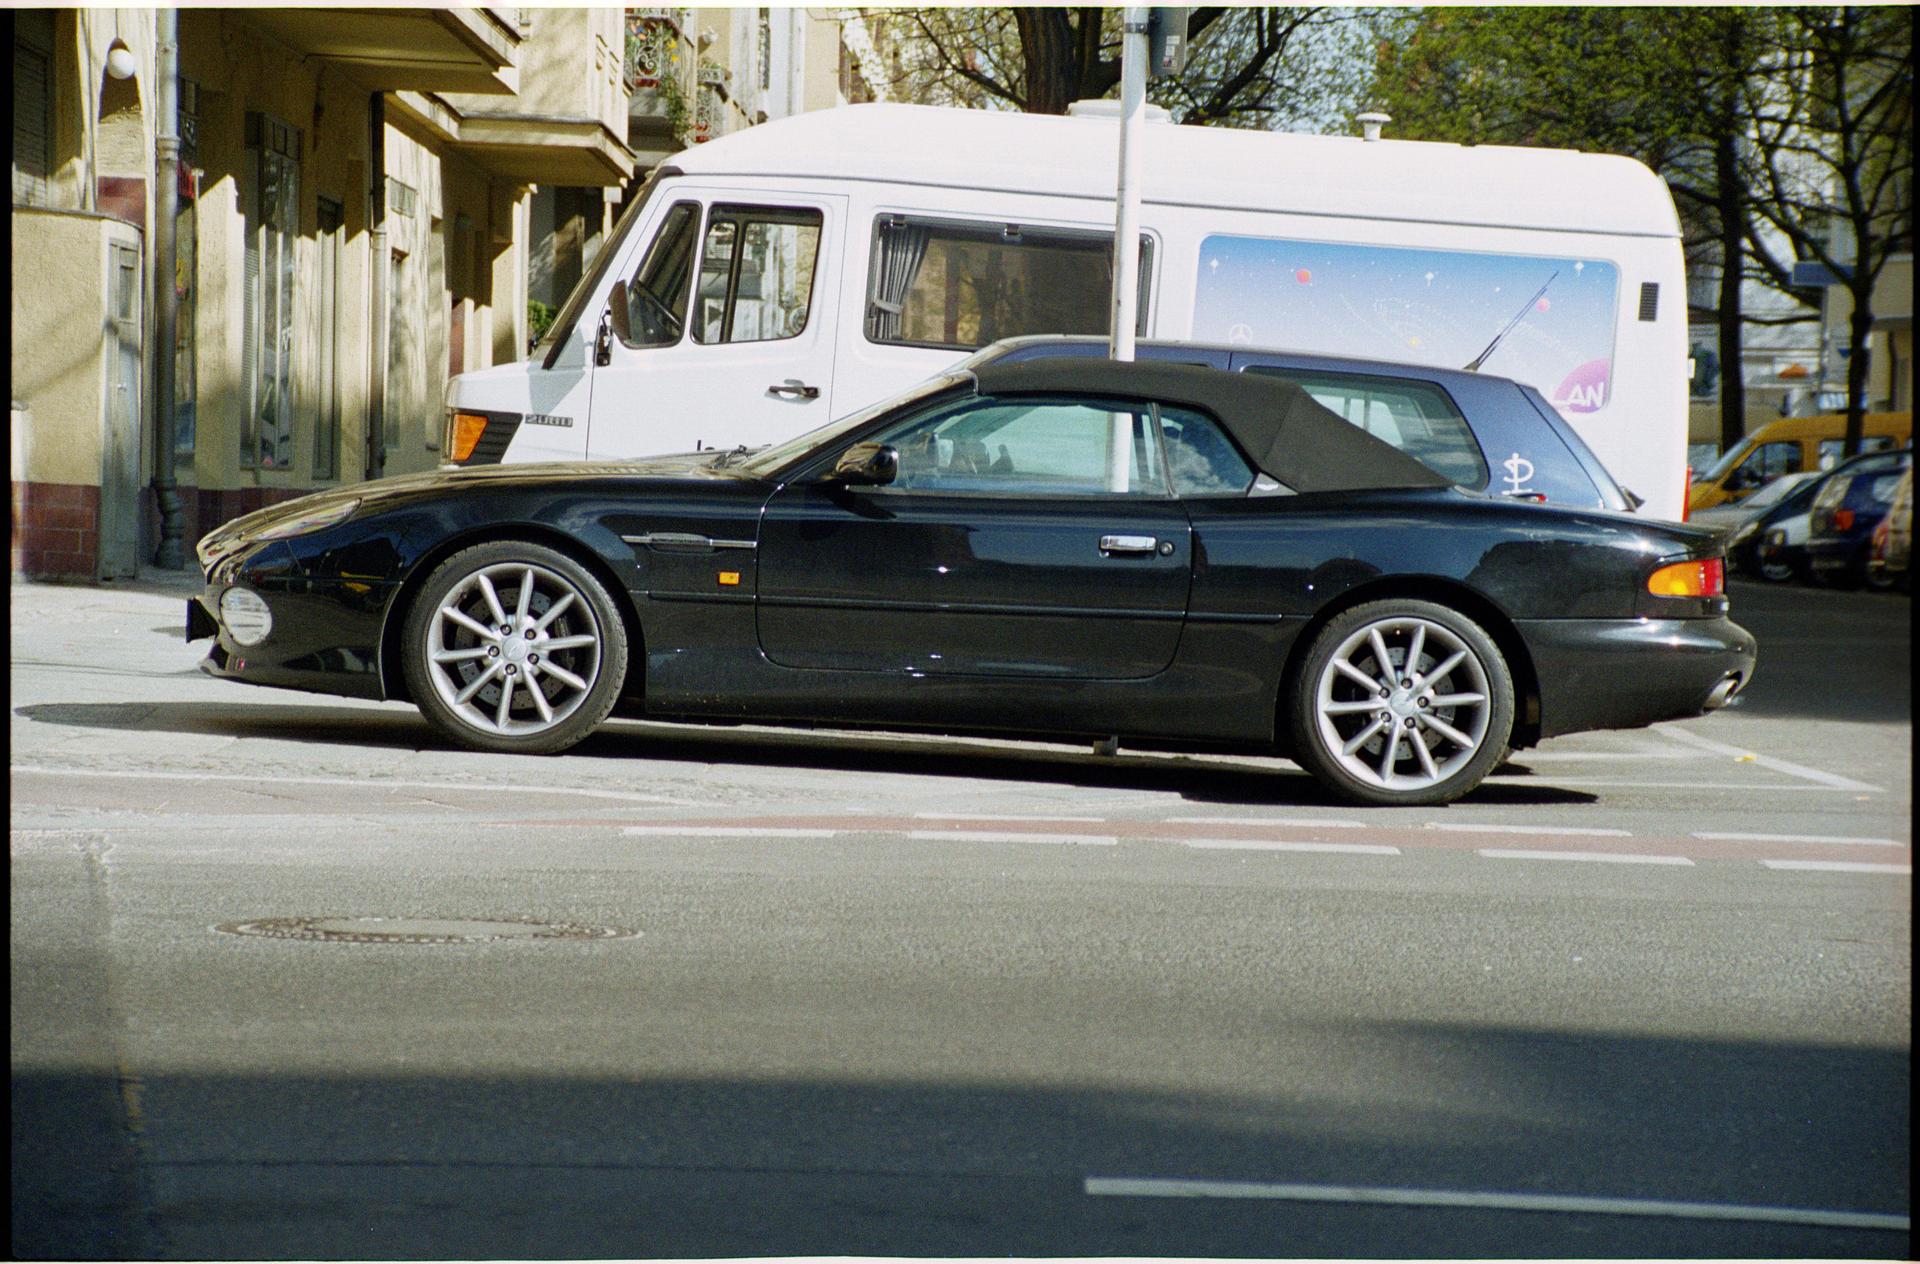 Aston Martin Db7 Vantage Volante 11 Berlin 2002 By Exotic Legends On Deviantart